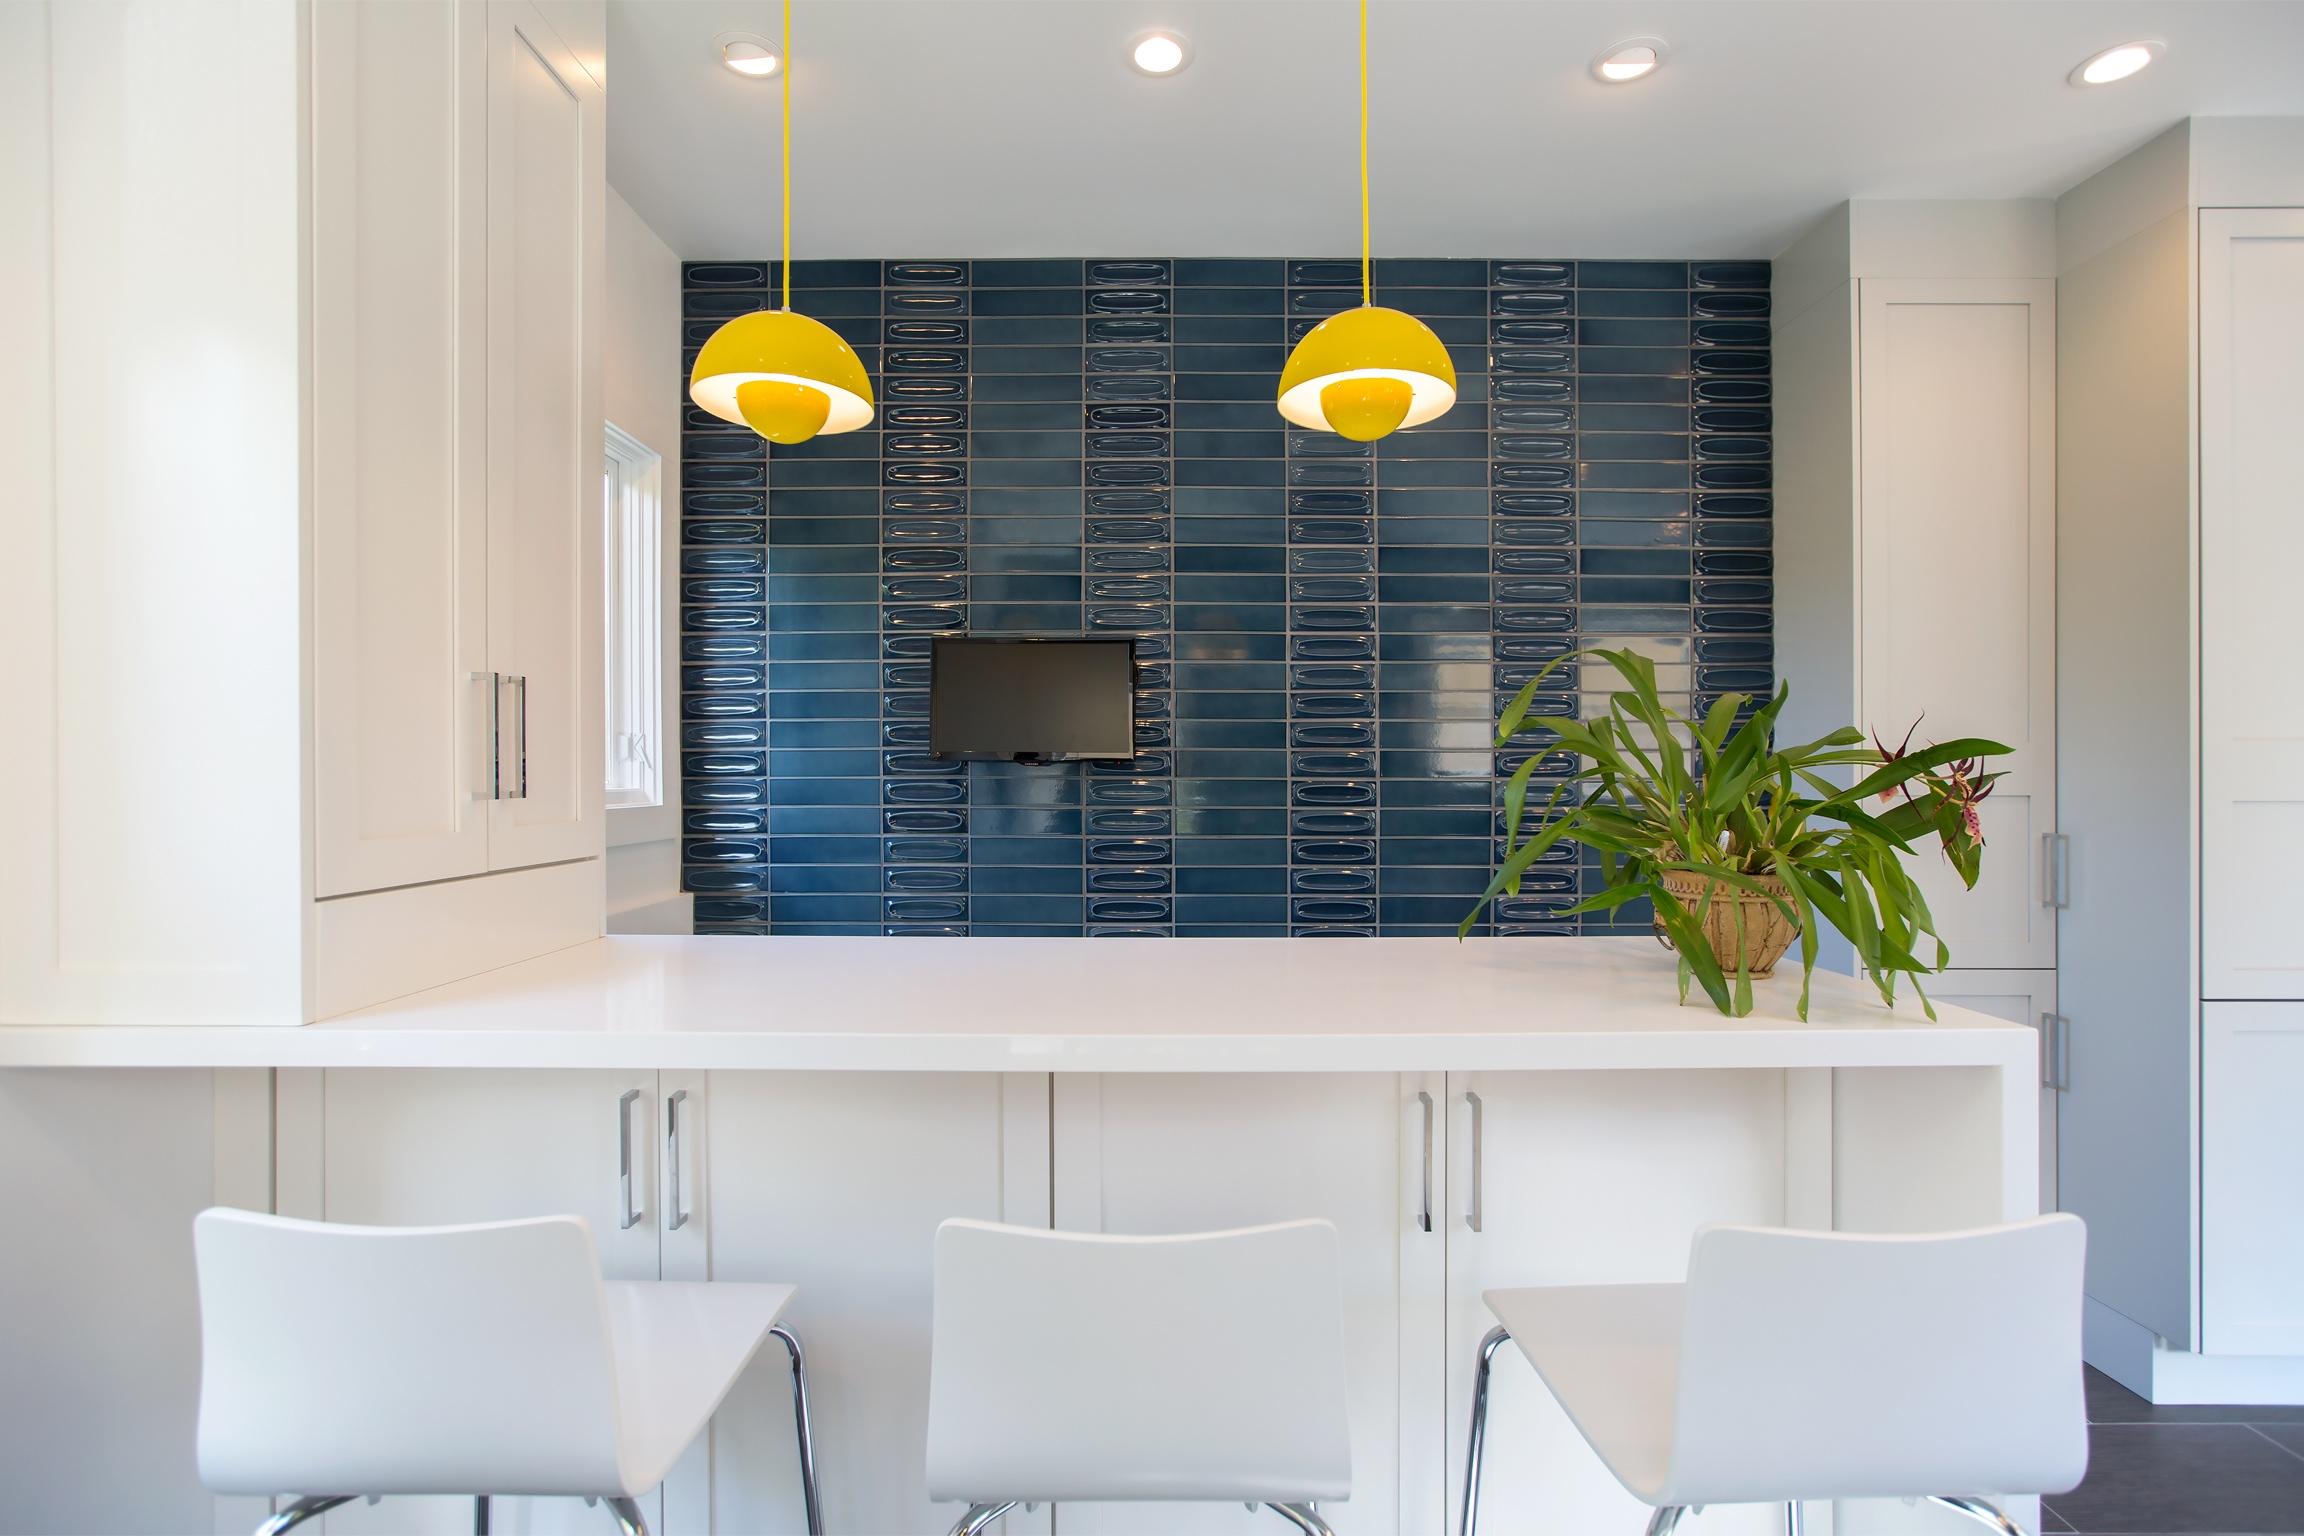 william-adams-design-christmas-tree-lane-2-kitchen-white-bar-seating-blue-tile-wall-yellow-lights.jpg